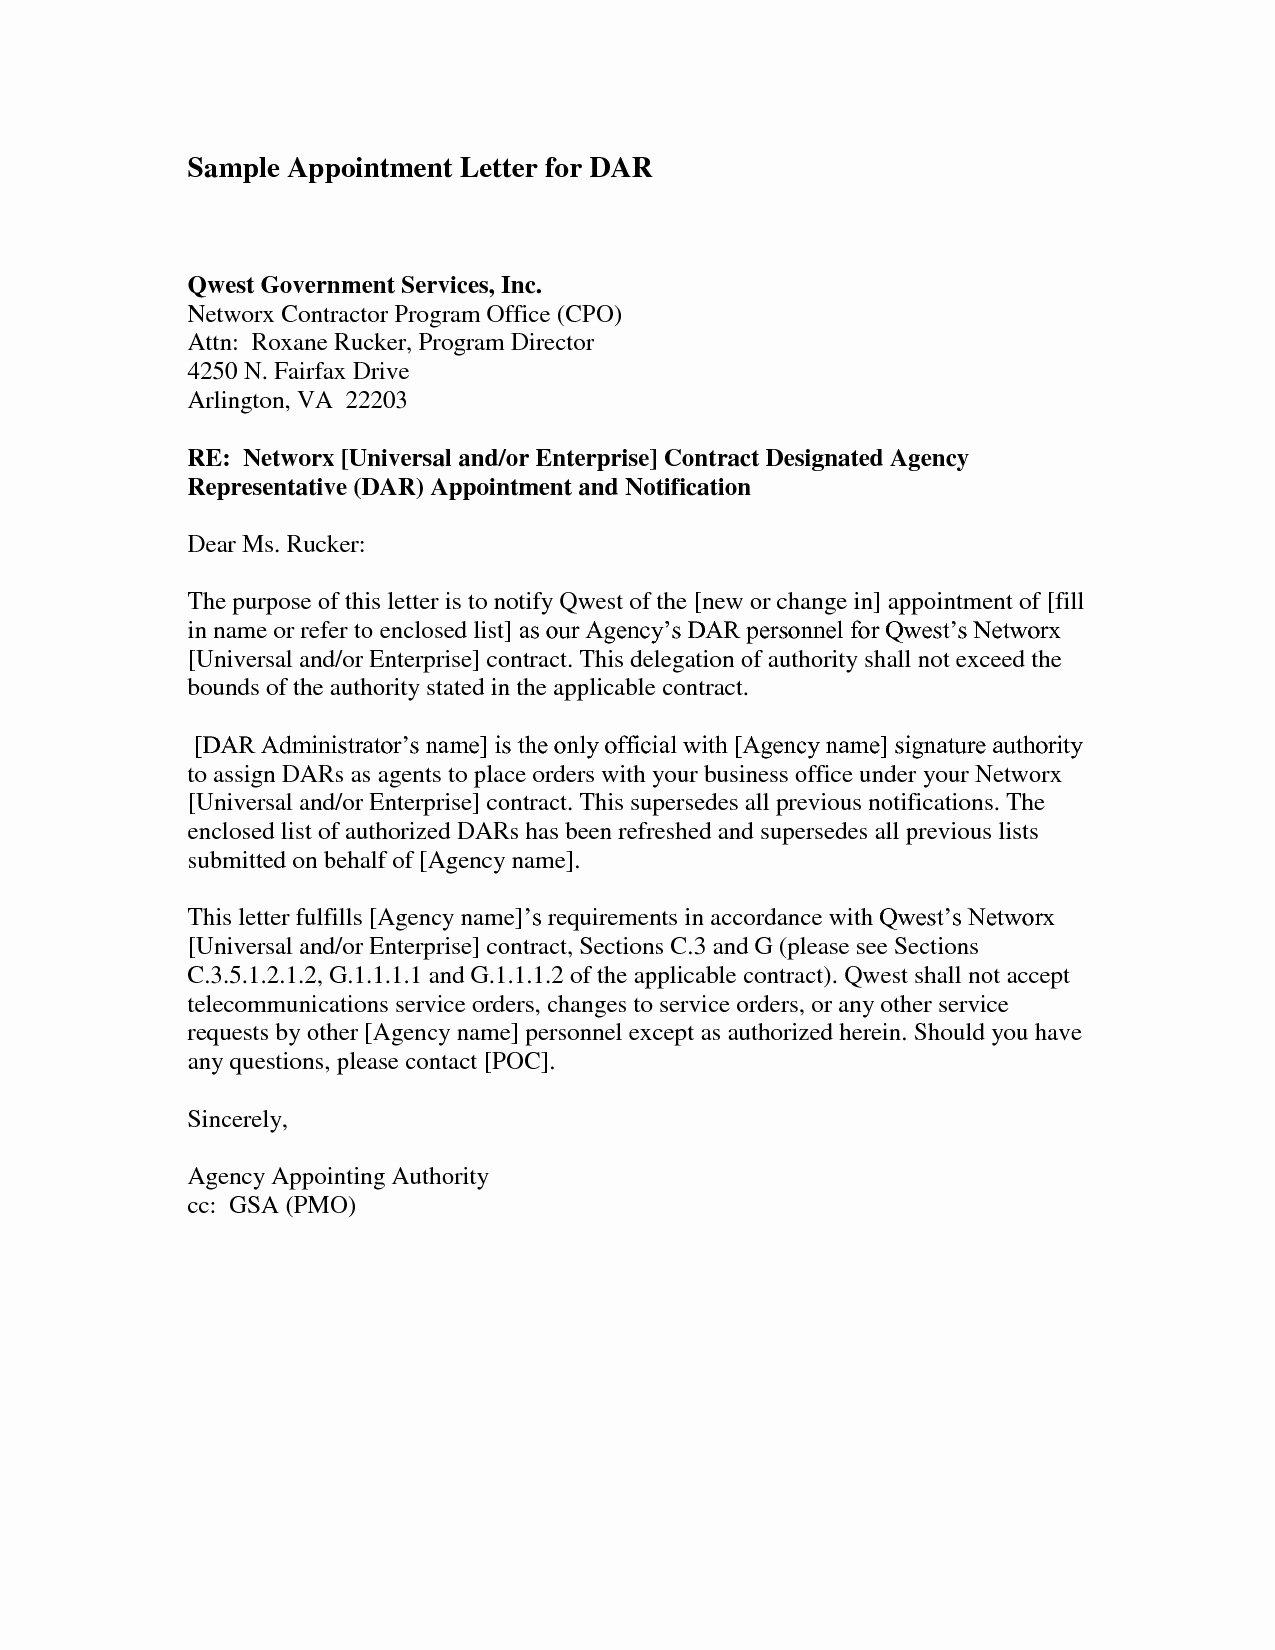 Board Resolution Template Non Profit Unique Board Member Removal Letter Template Examples